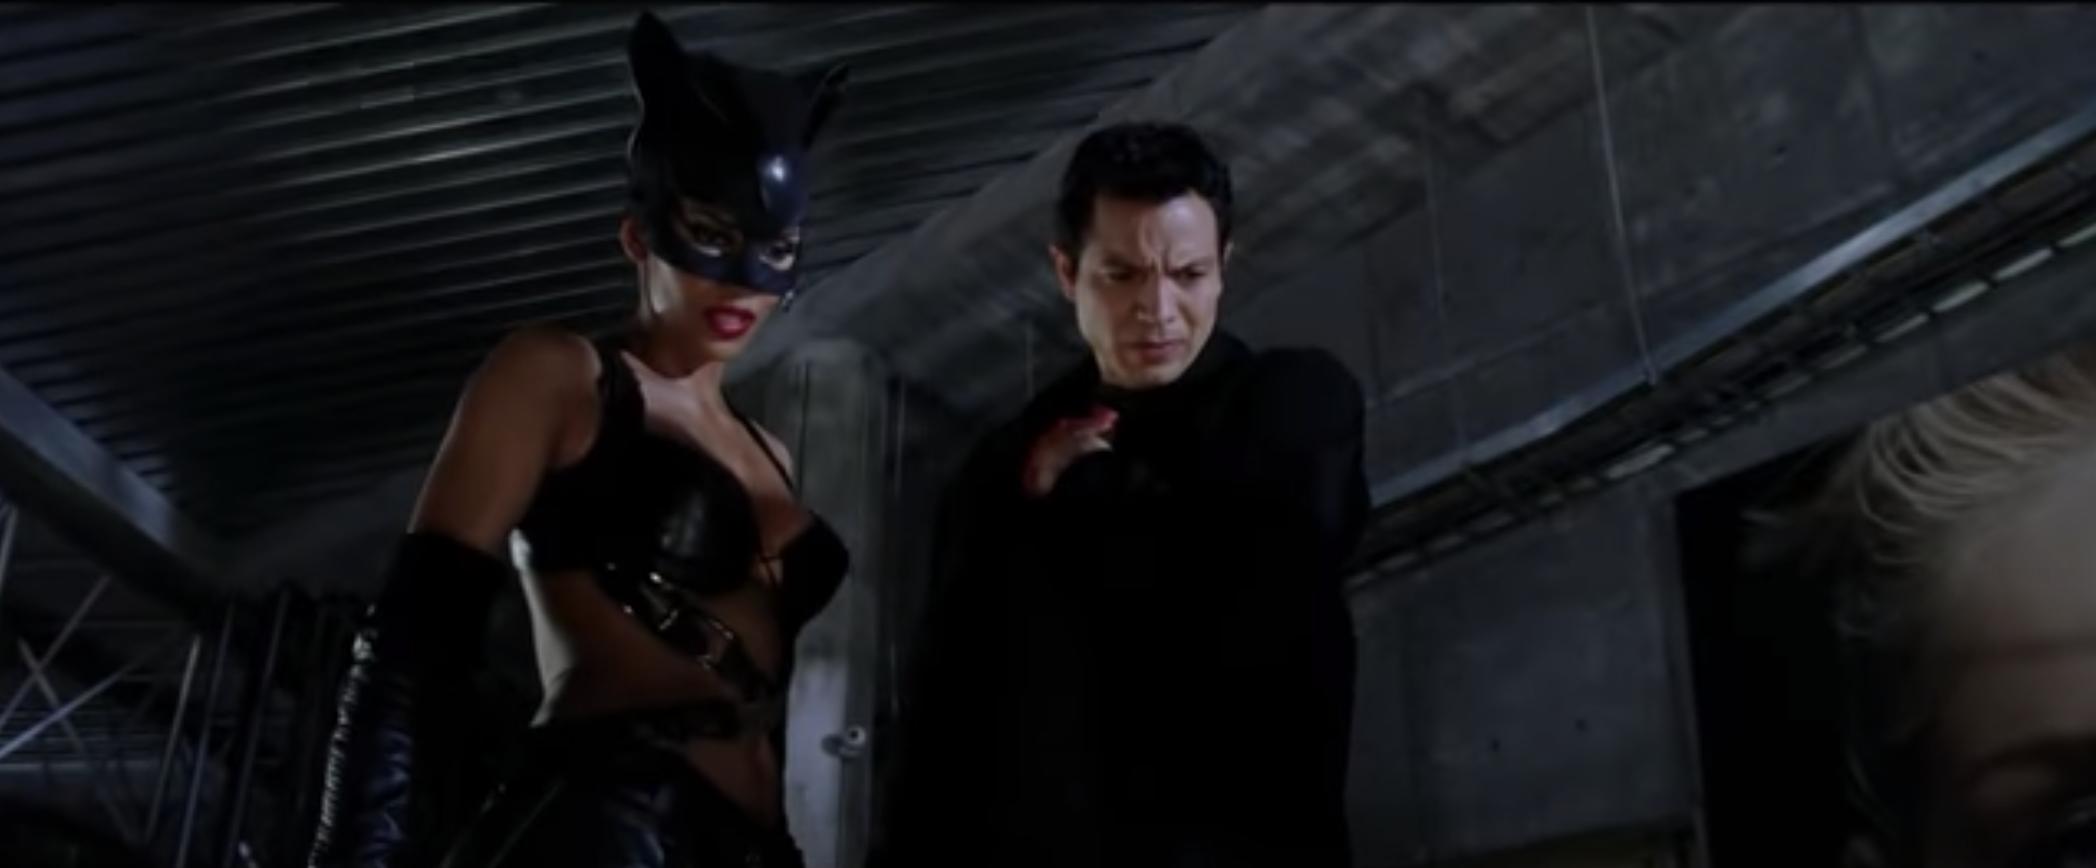 Halle Berry and Benjamin Bratt in Catwoman